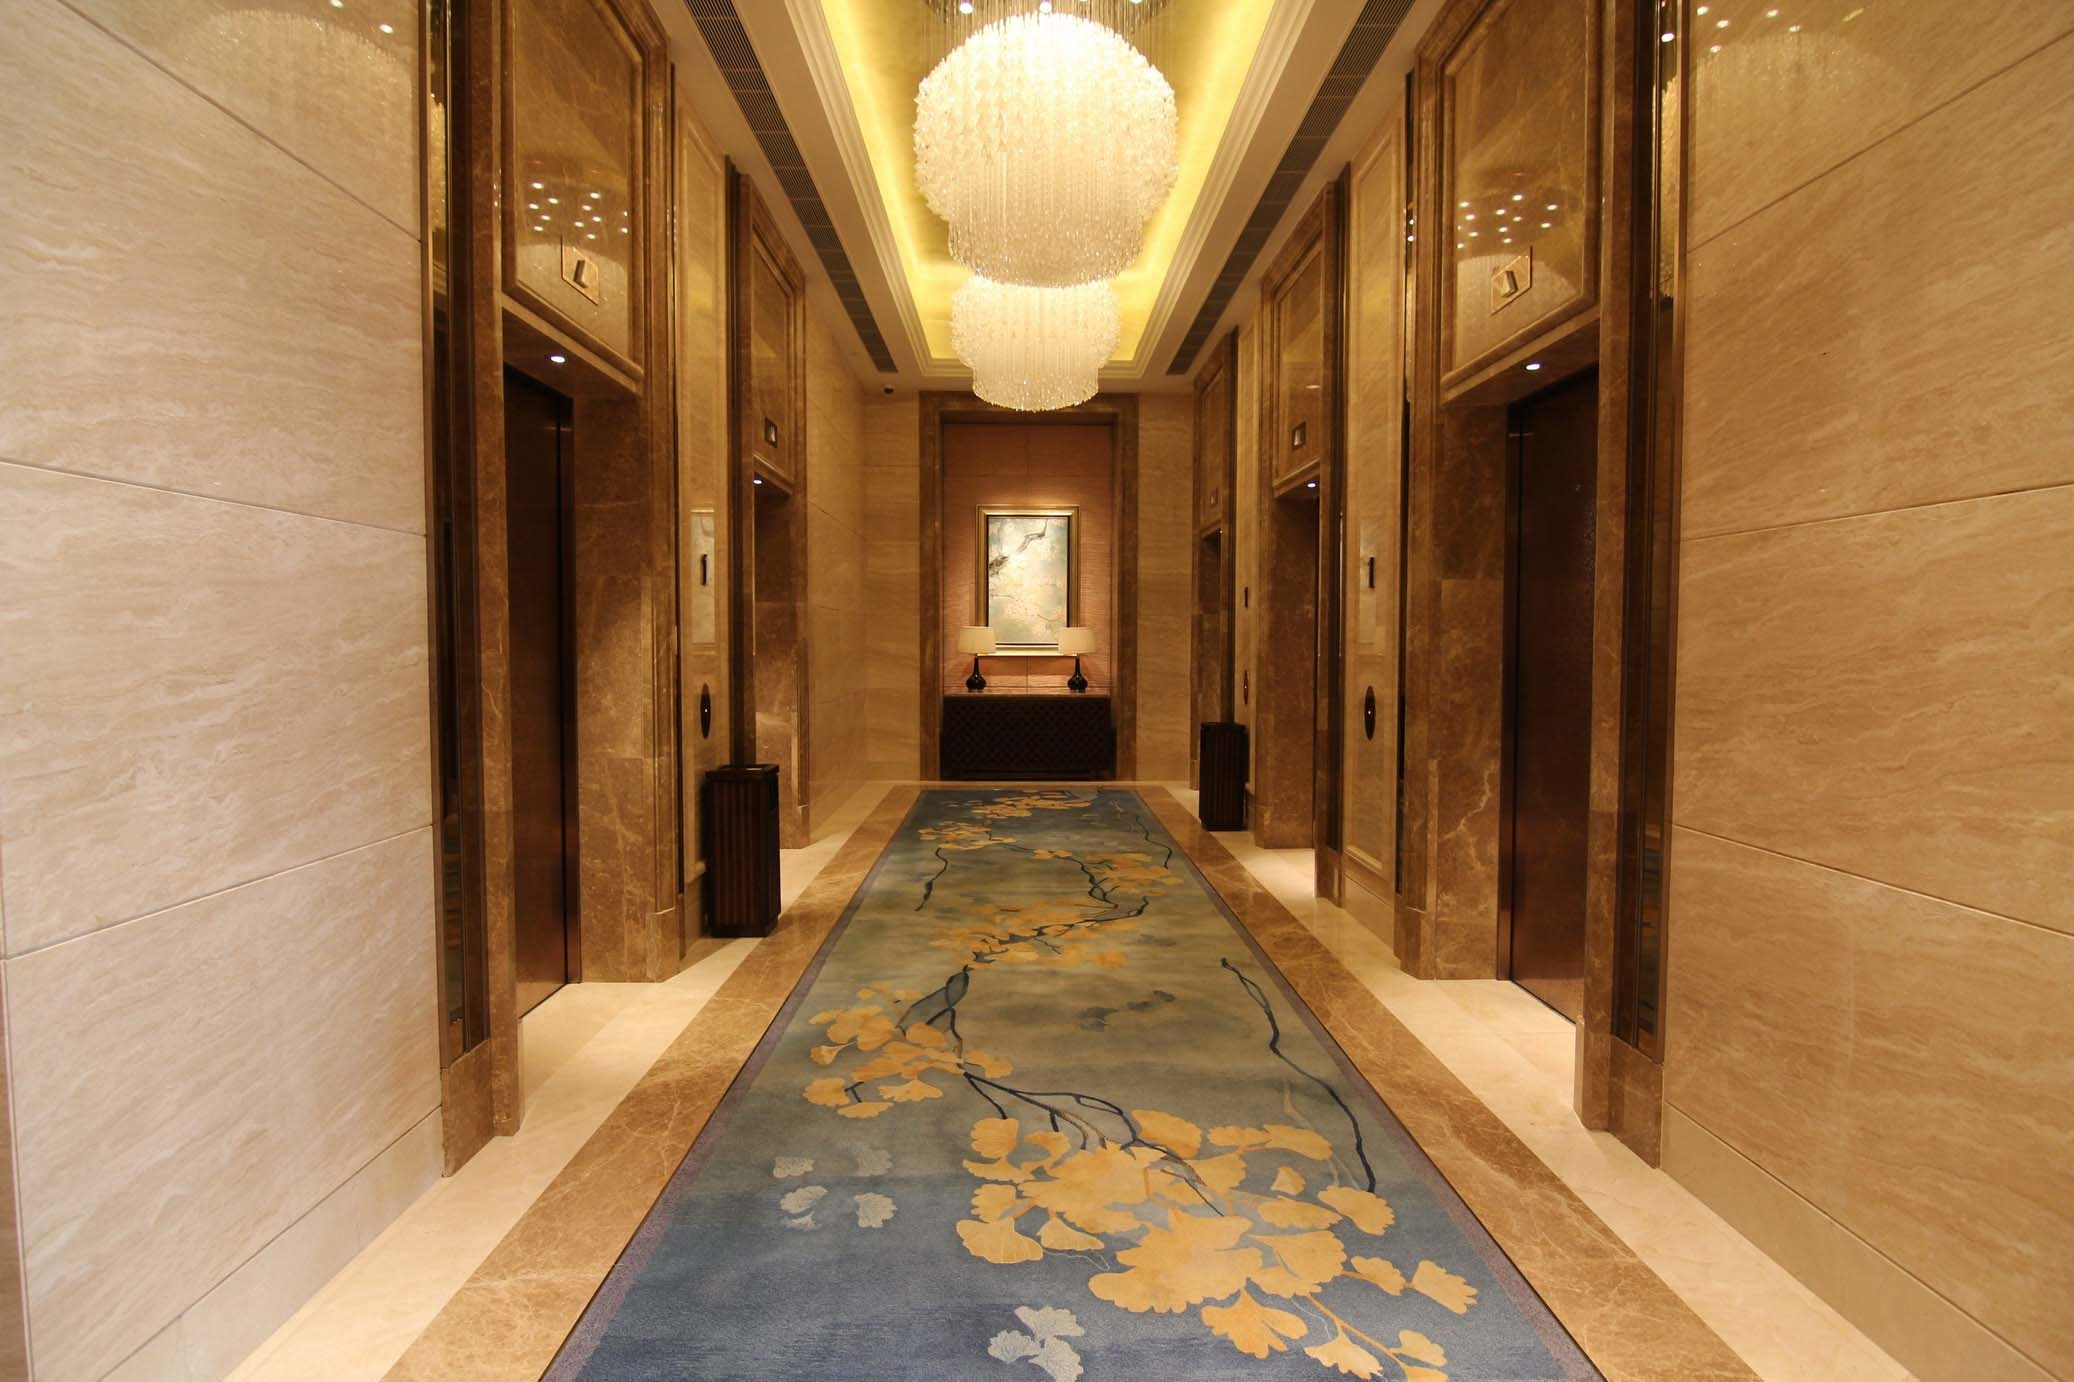 China High Quality Wool Amp Nylon Carpet For Shangri La